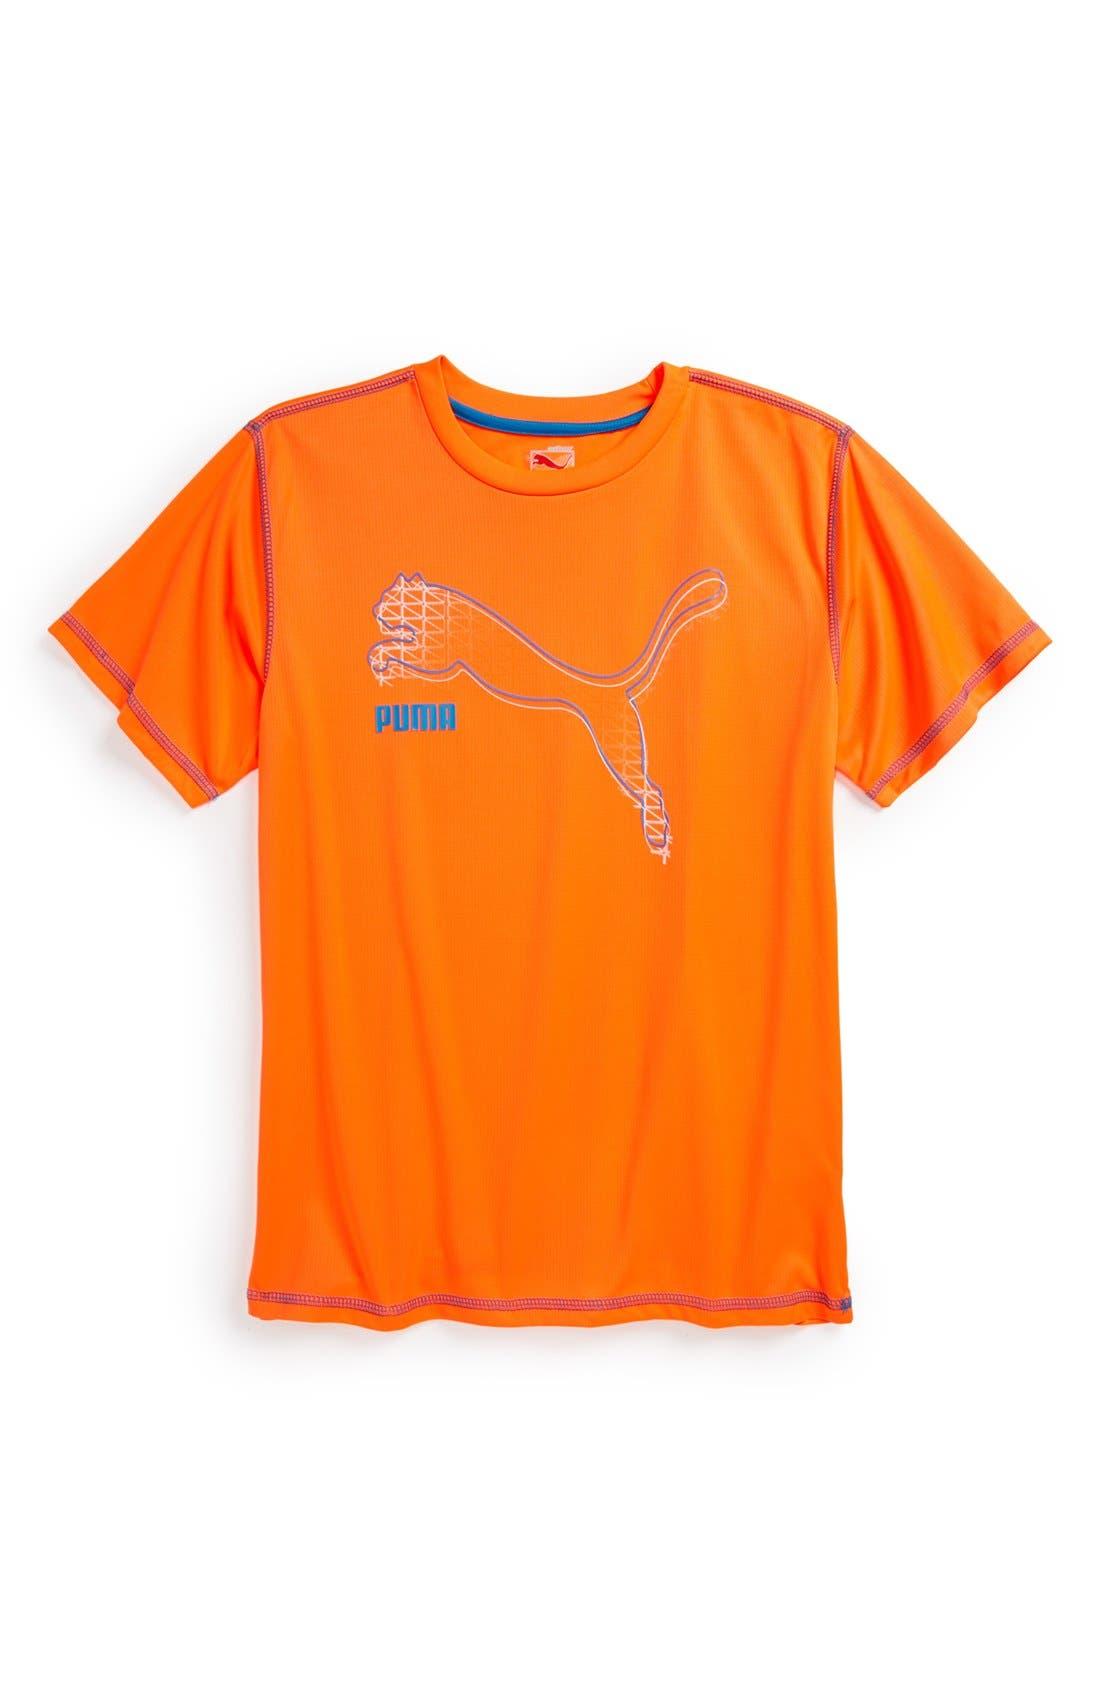 Alternate Image 1 Selected - PUMA 'Originals' T-Shirt (Big Boys)